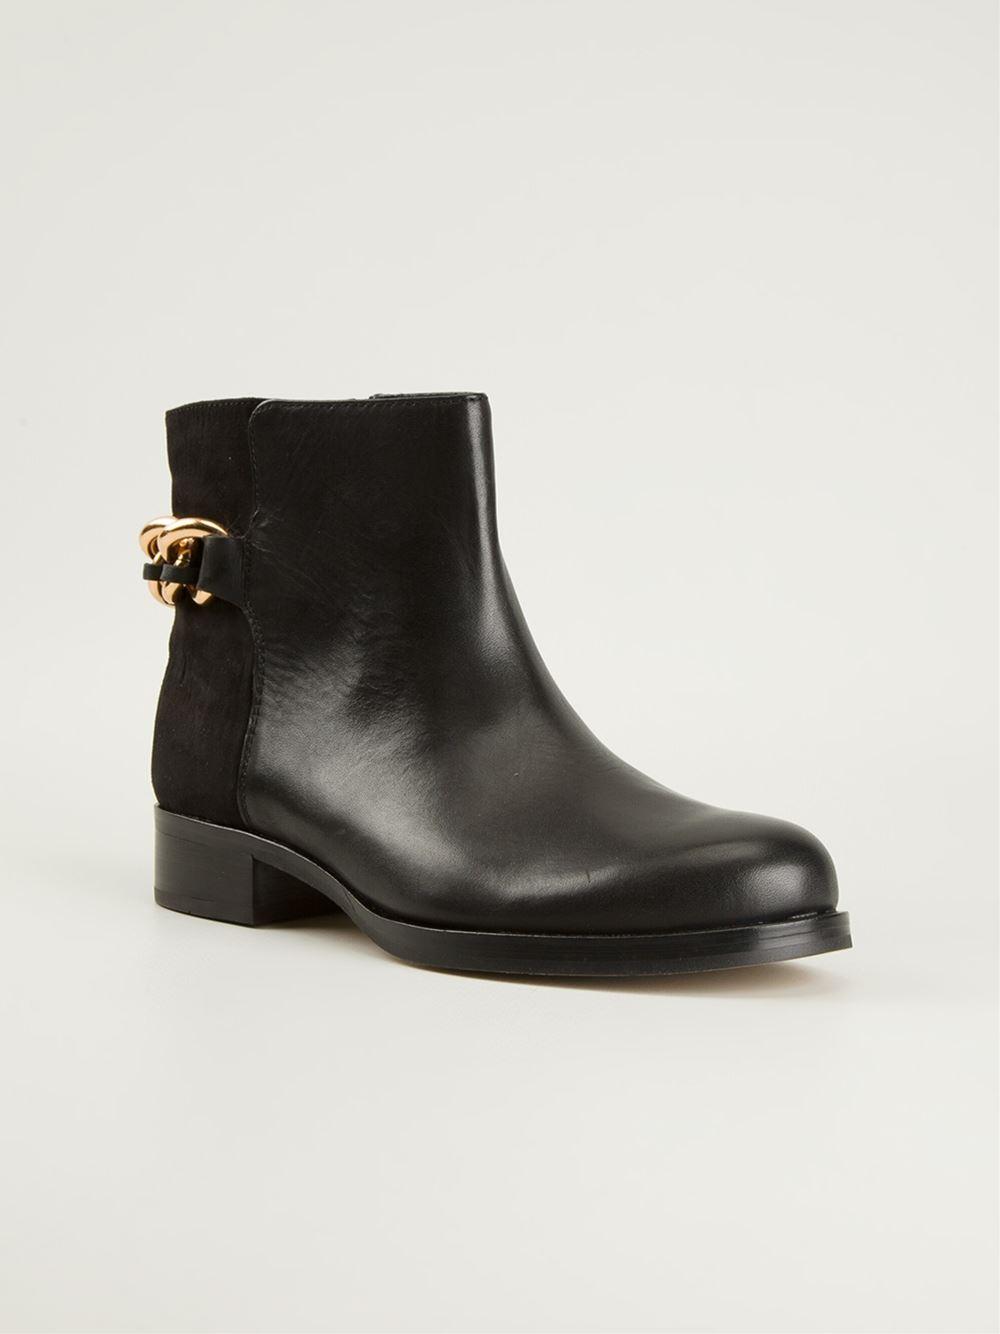 eb8fd659ece28c Lyst - Sam Edelman  Chester  Chain Ankle Boot in Black